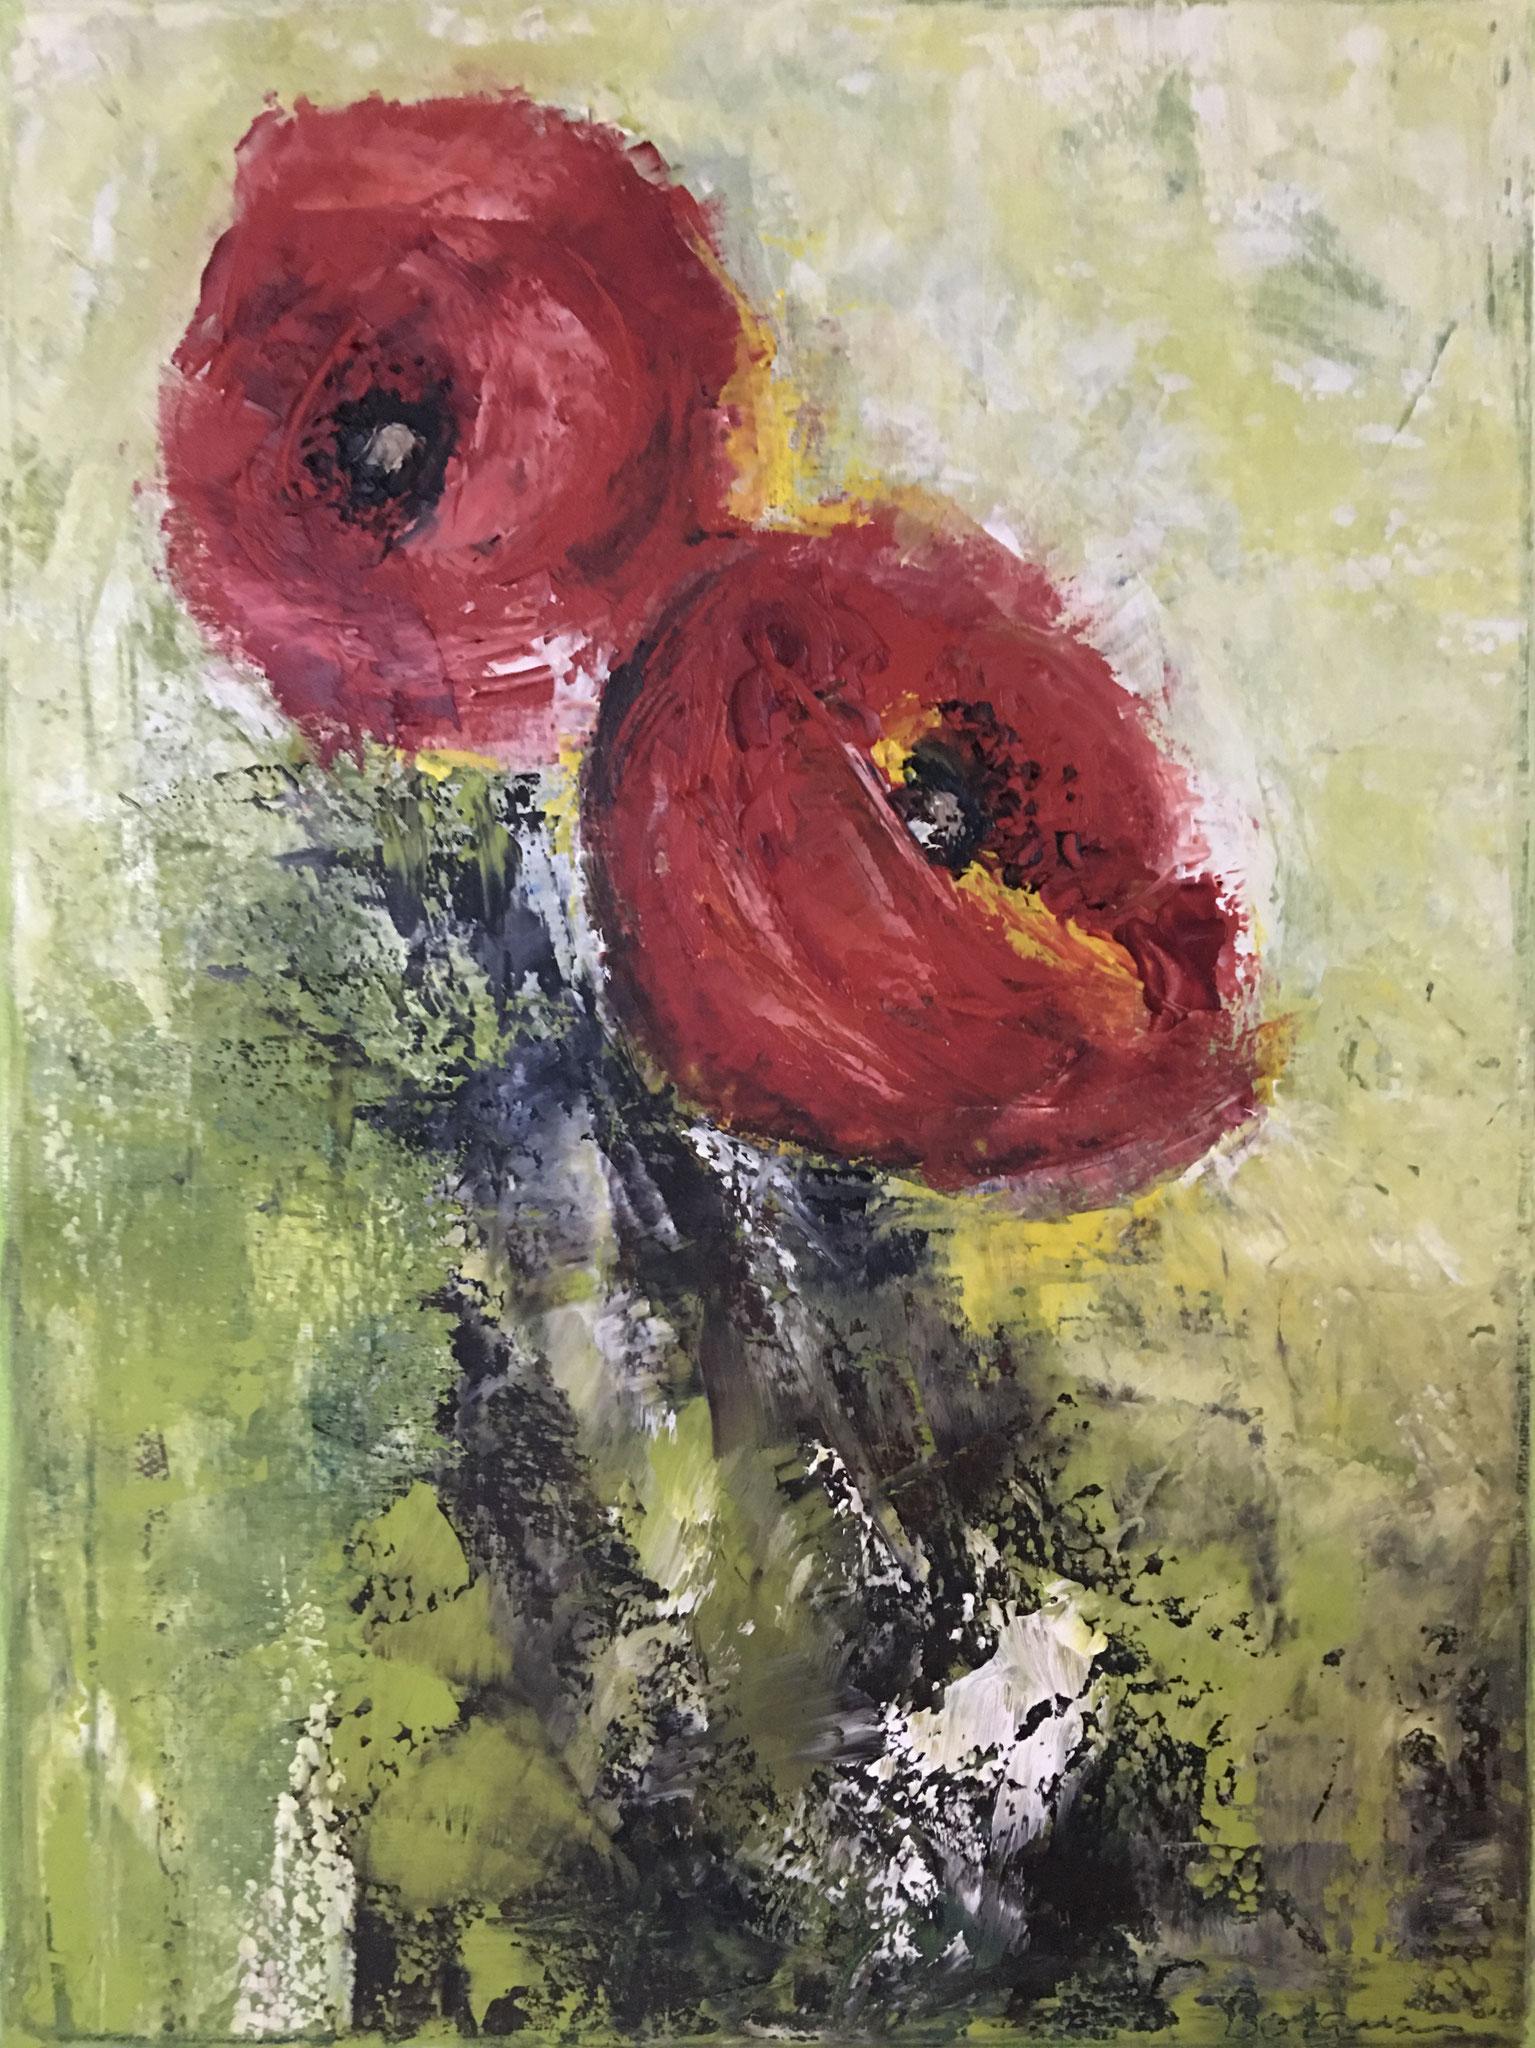 """Mohnblumen"", Öl auf Leinwand, 30 x 40 cm, gespachtelt (verkauft)"